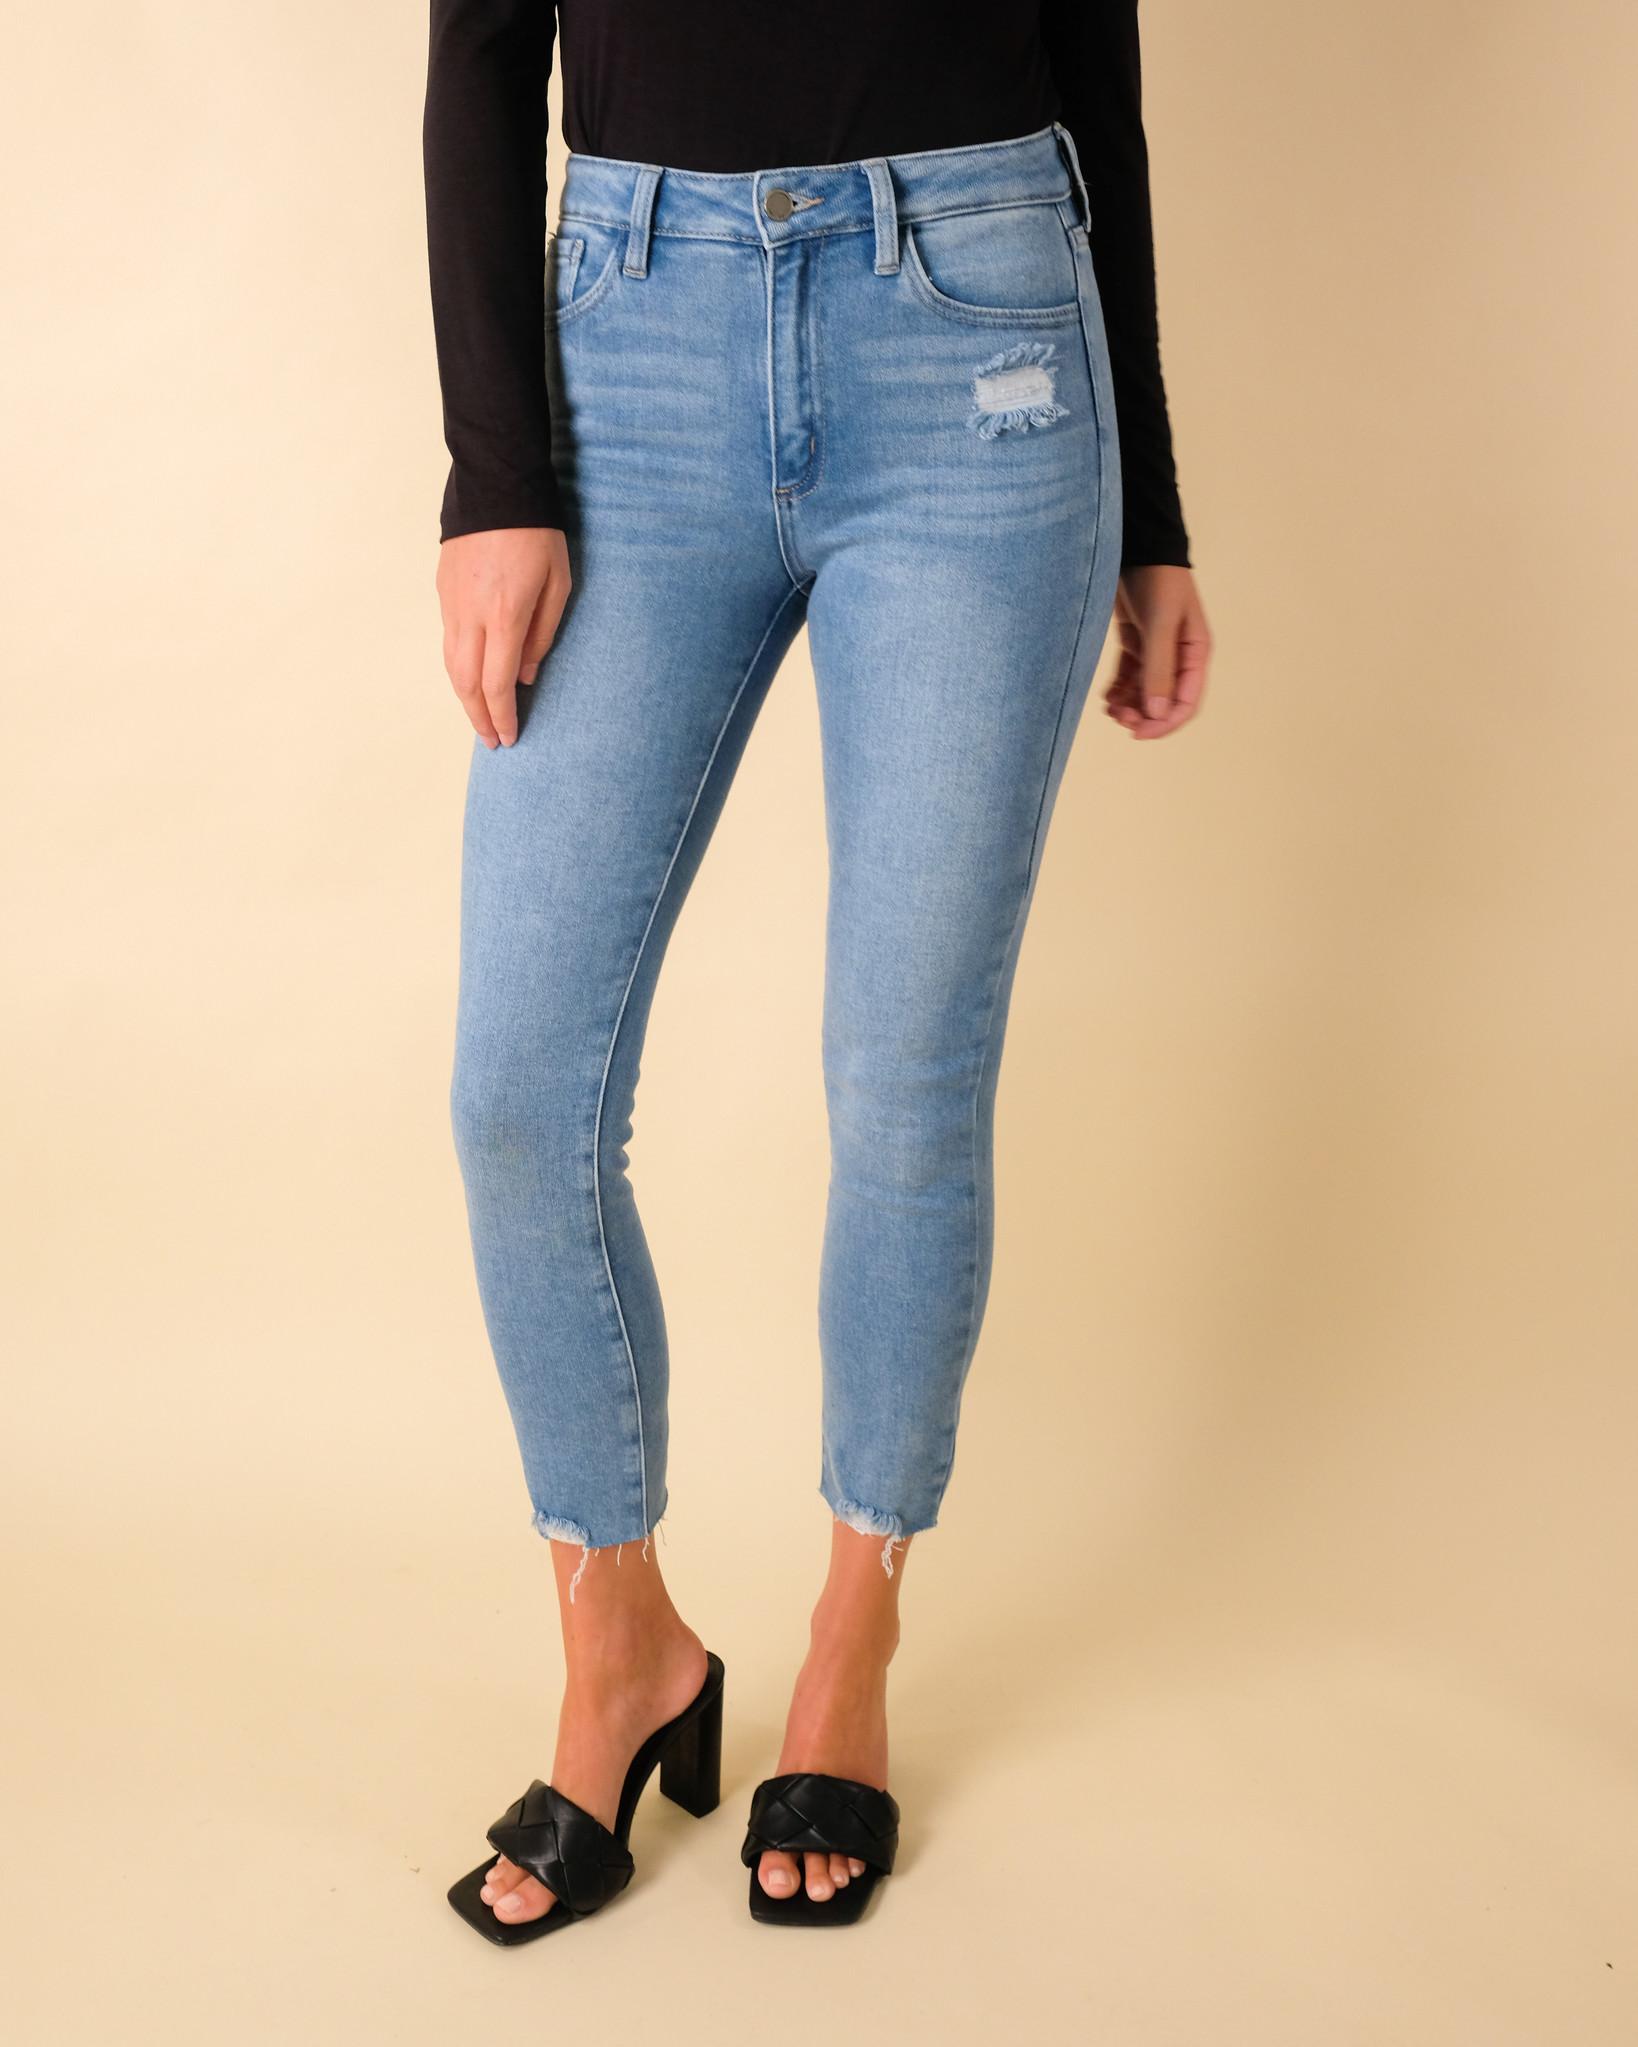 Jeans Scissor Hem Skinny Jean